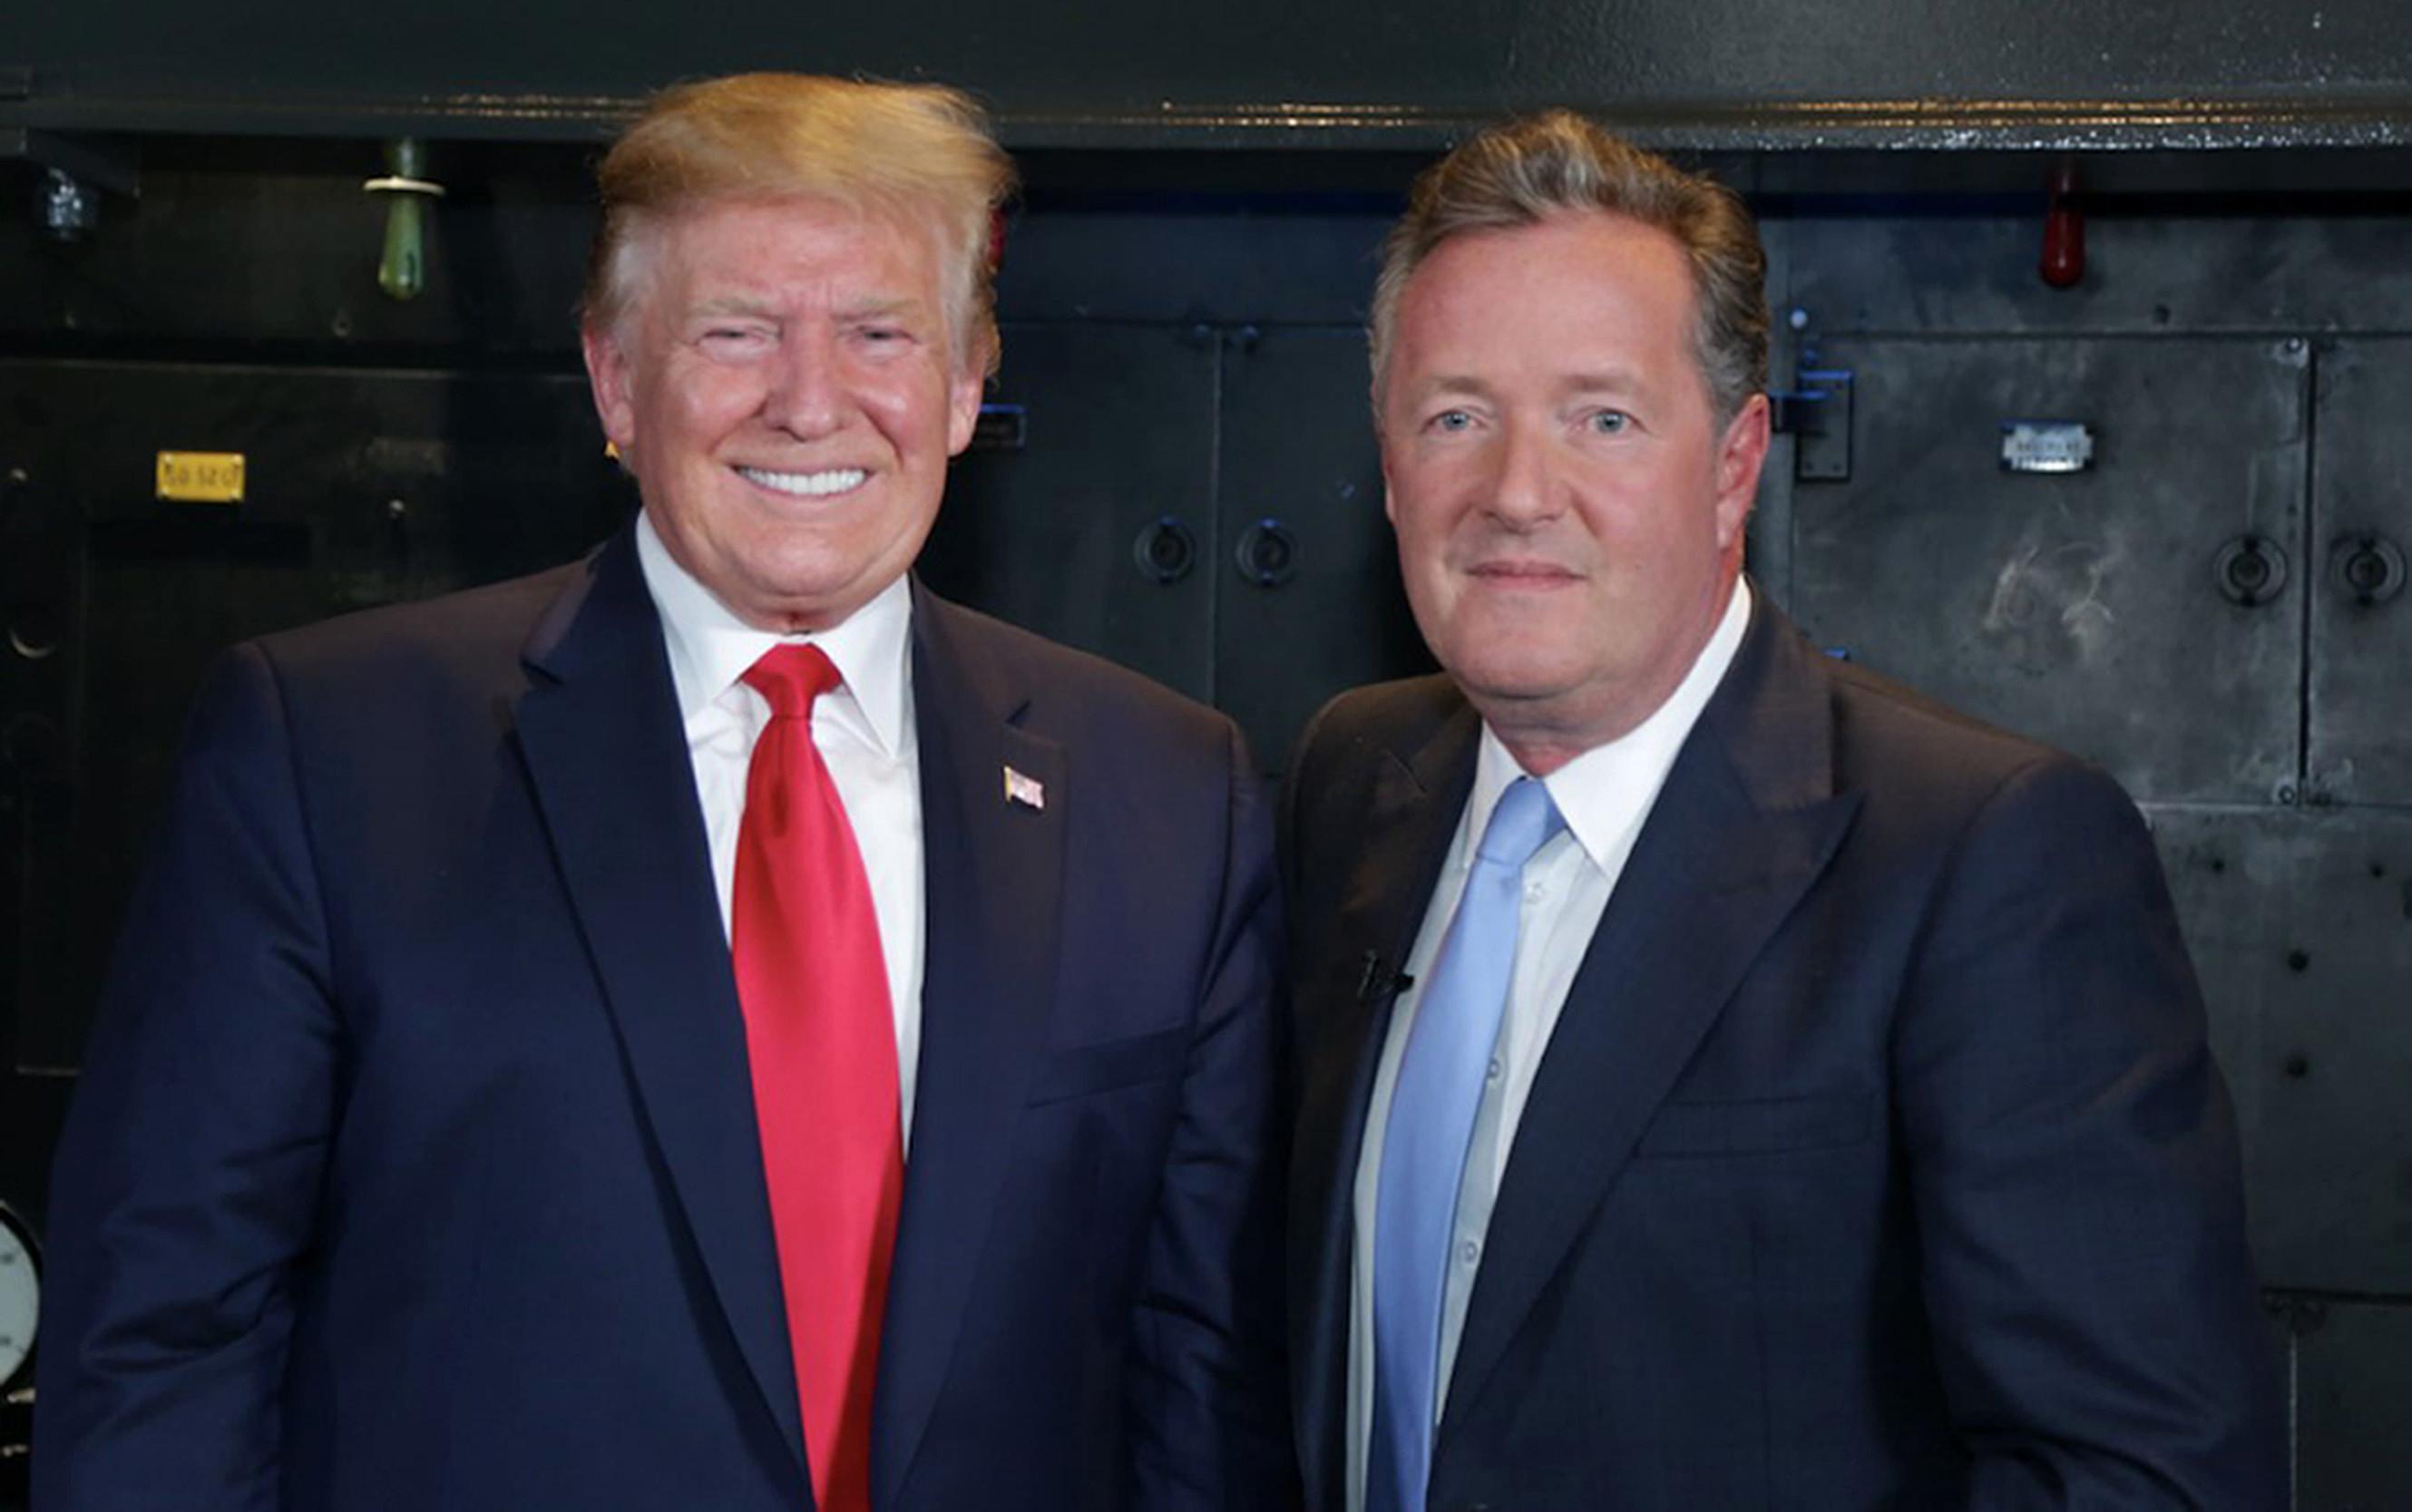 Donald Trump Unfollows Long Time Friend Piers Morgan On Twitter (See Reason)